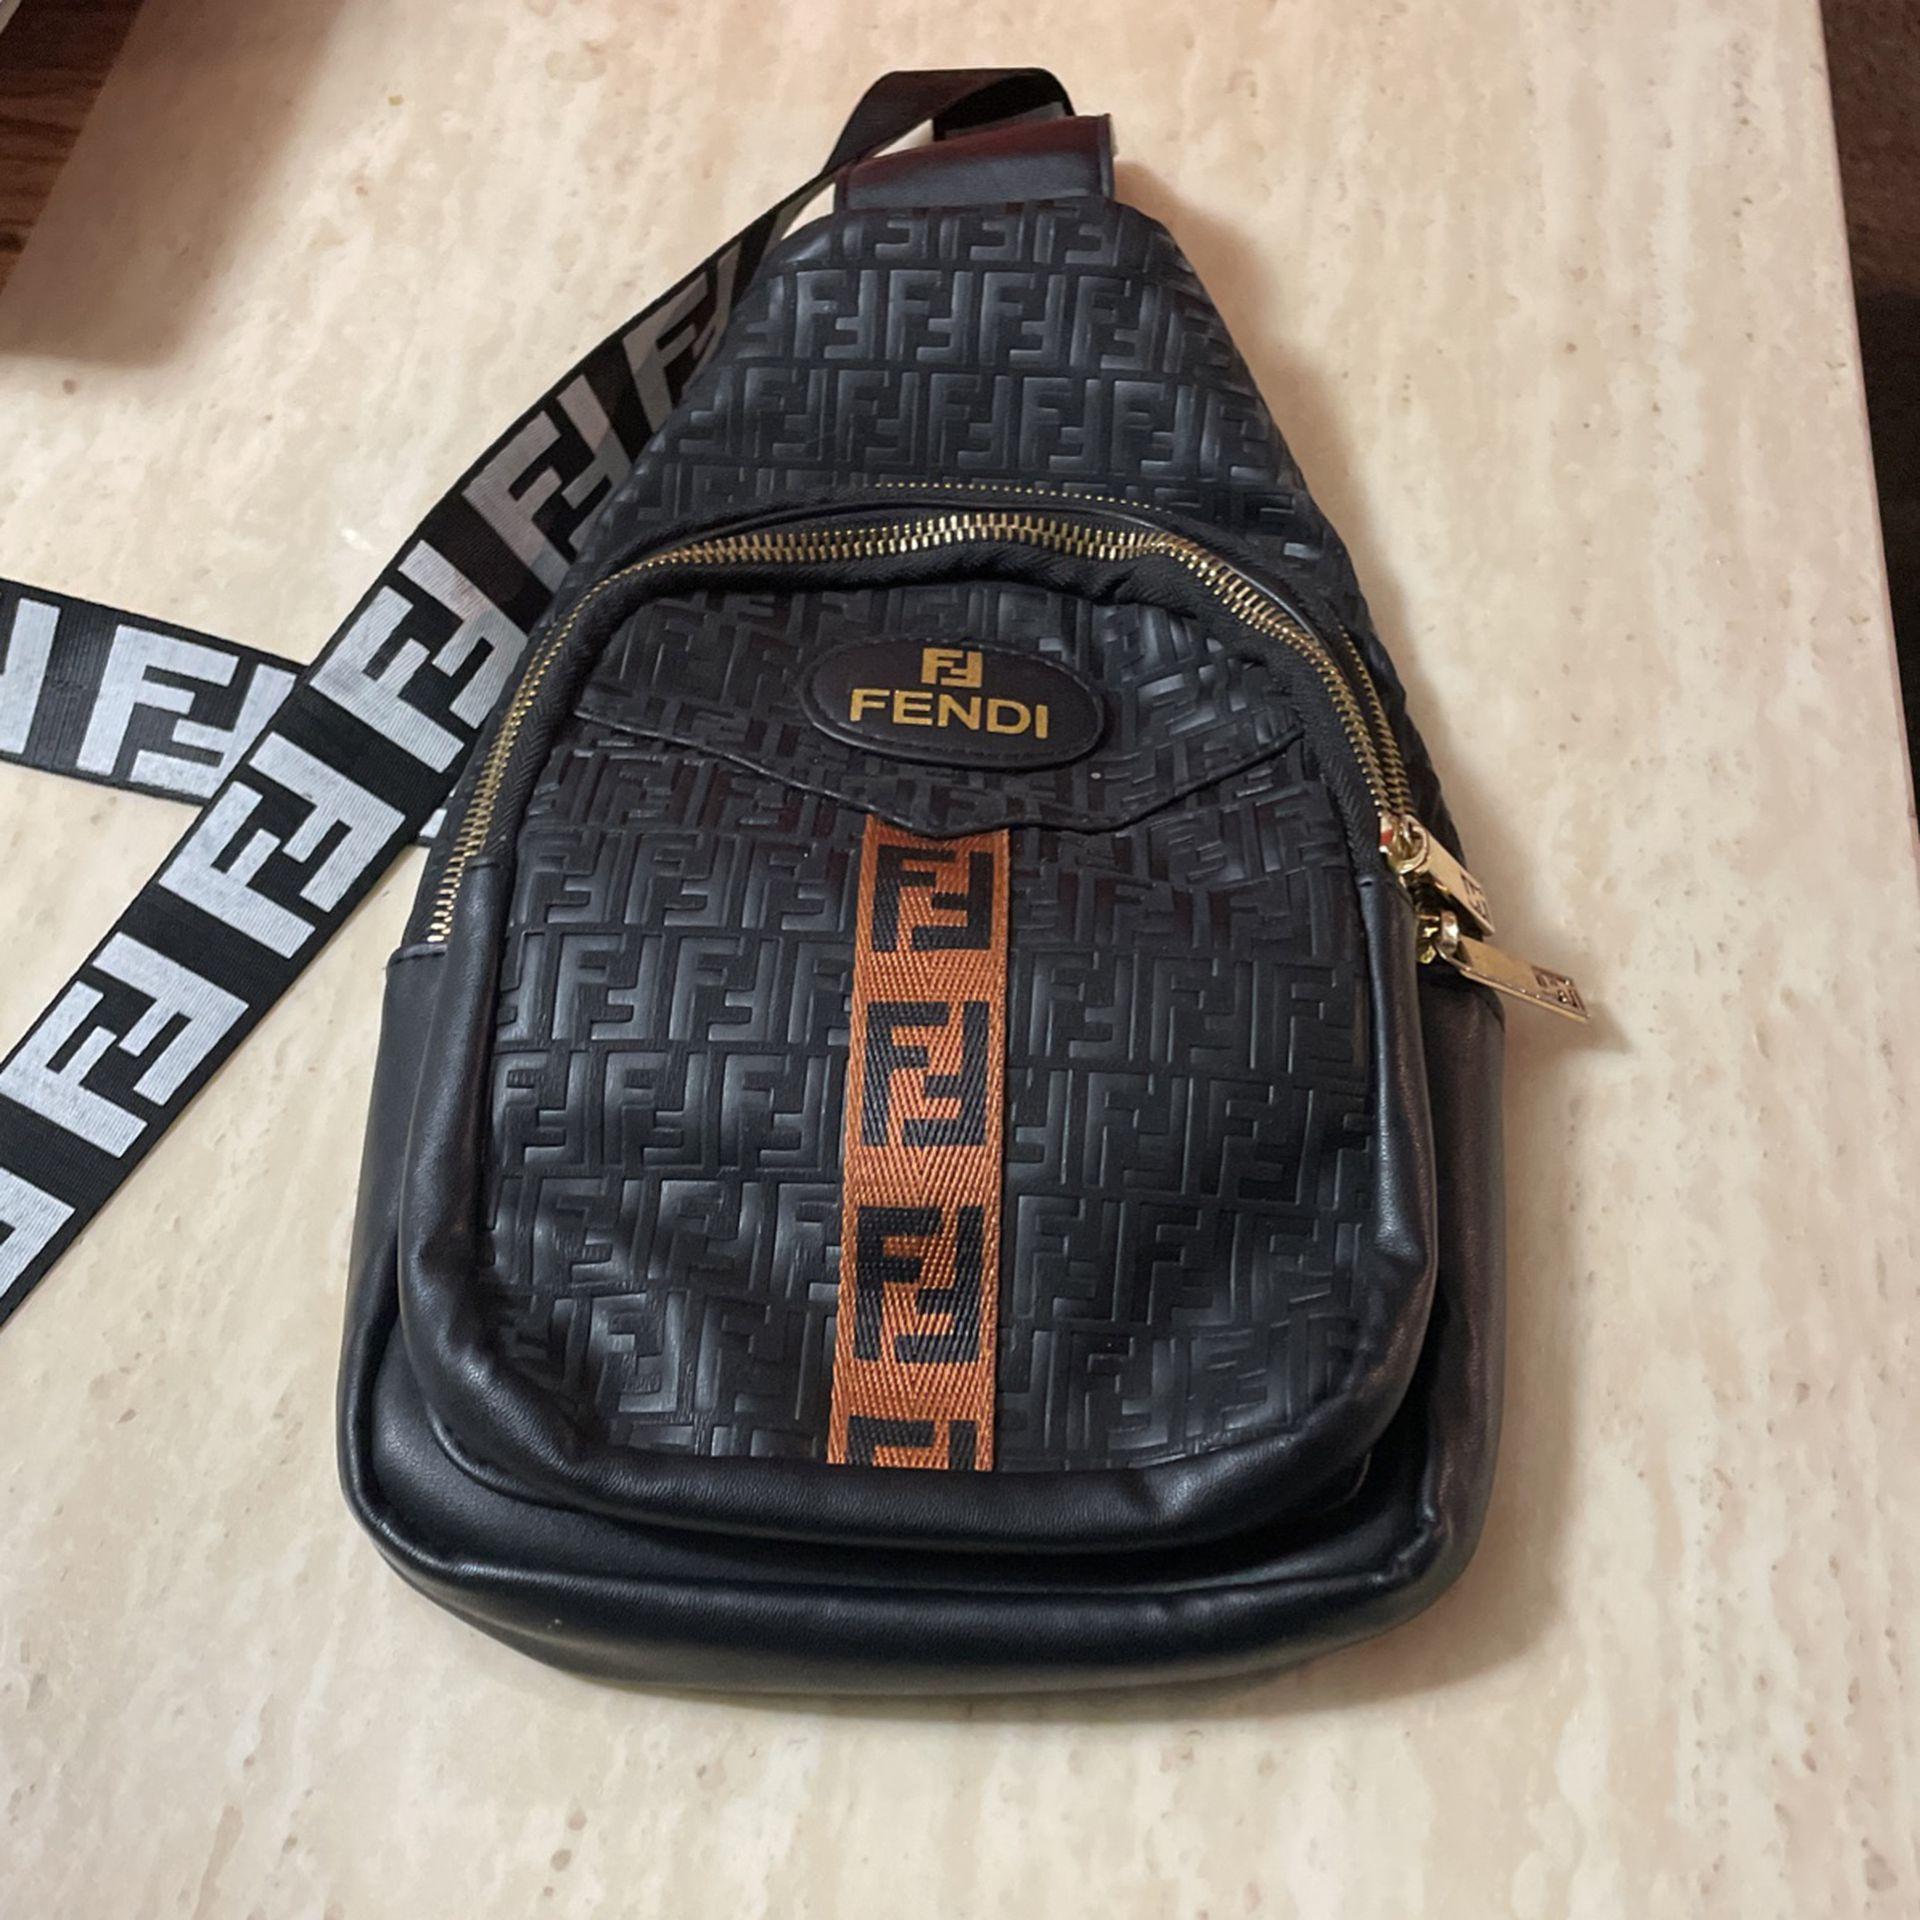 Fendi Satchel Bag